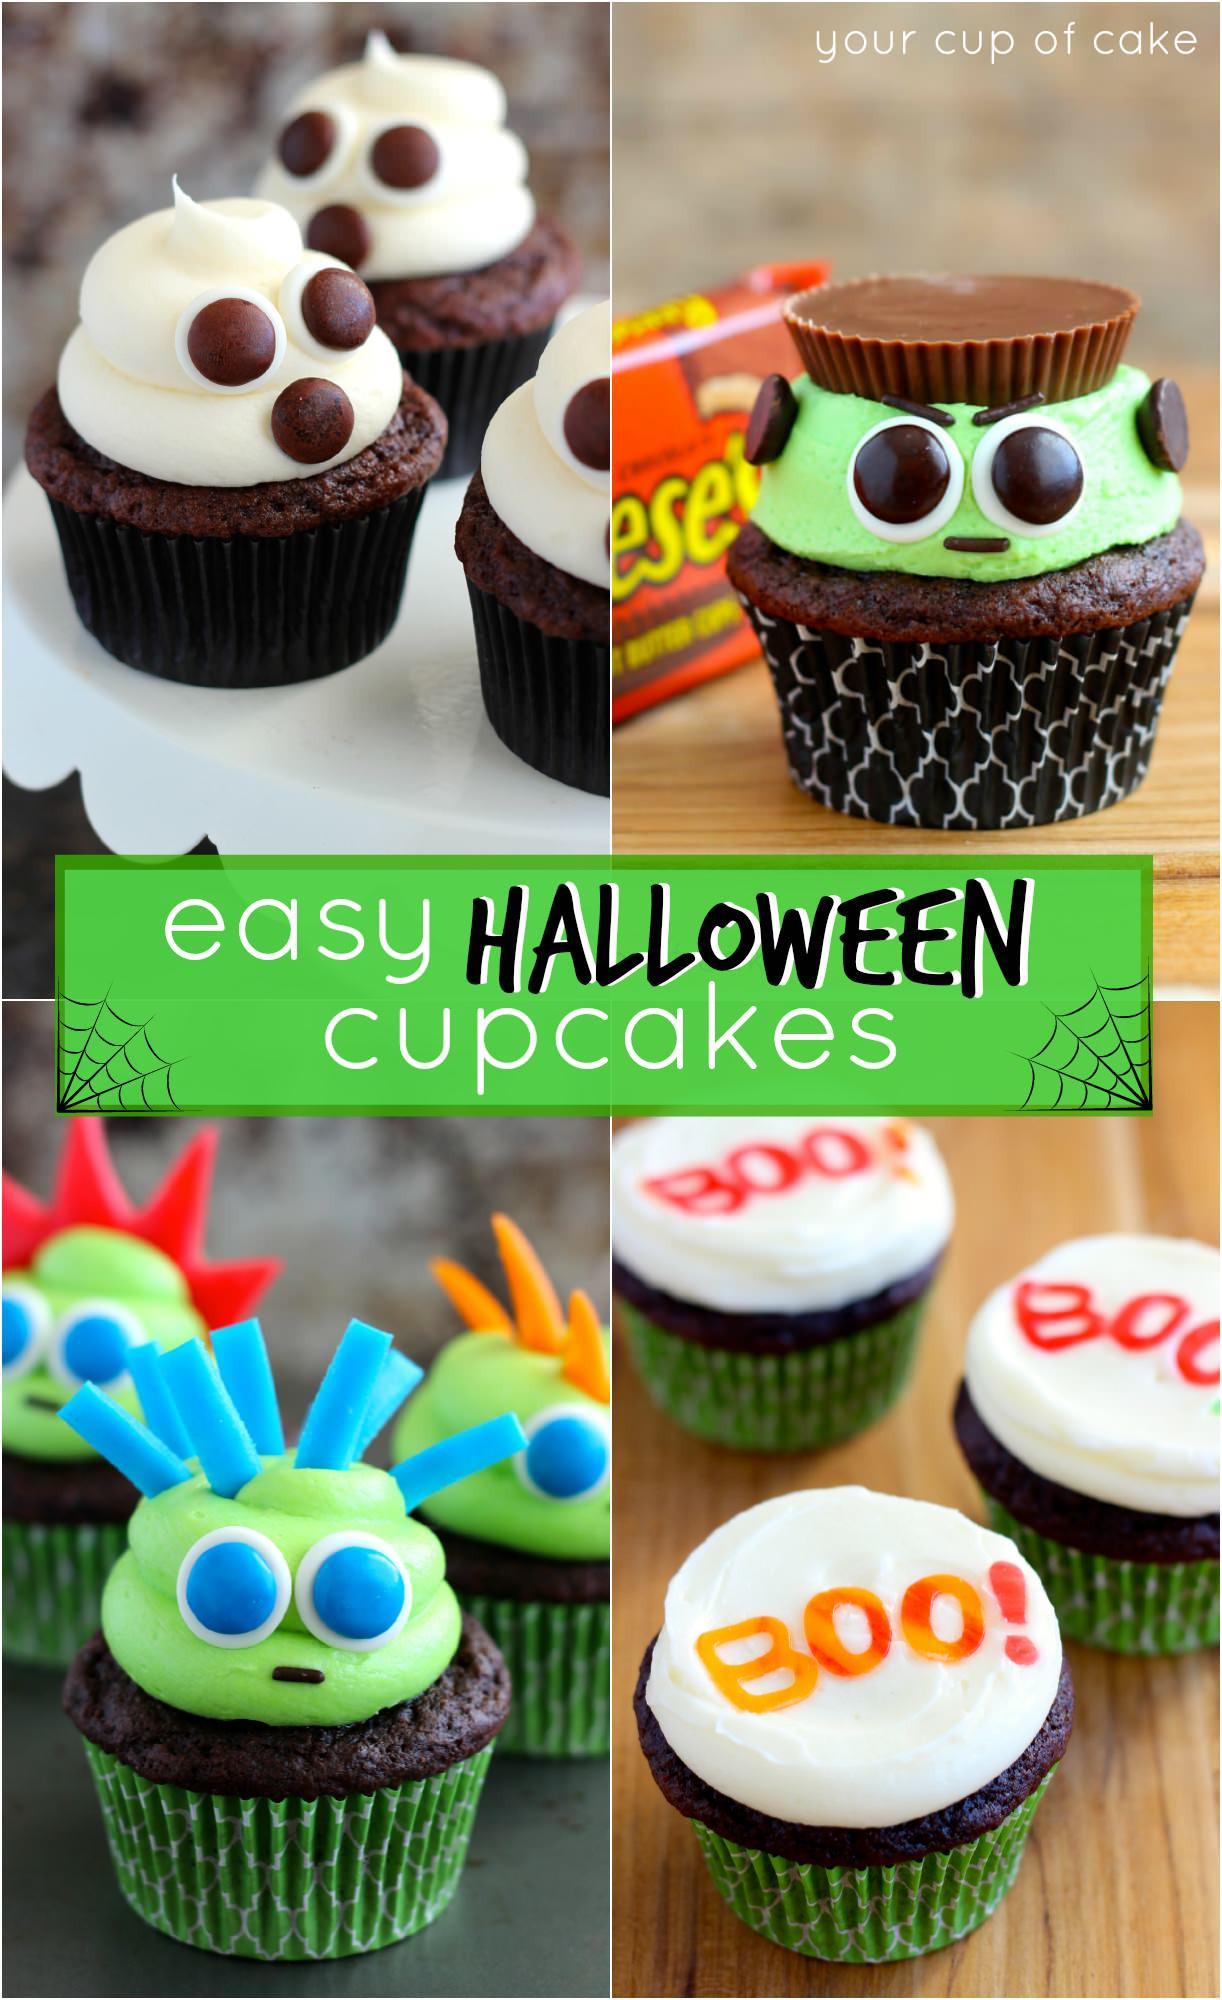 Cute Halloween Cupcakes  Easy Halloween Cupcake Ideas Your Cup of Cake